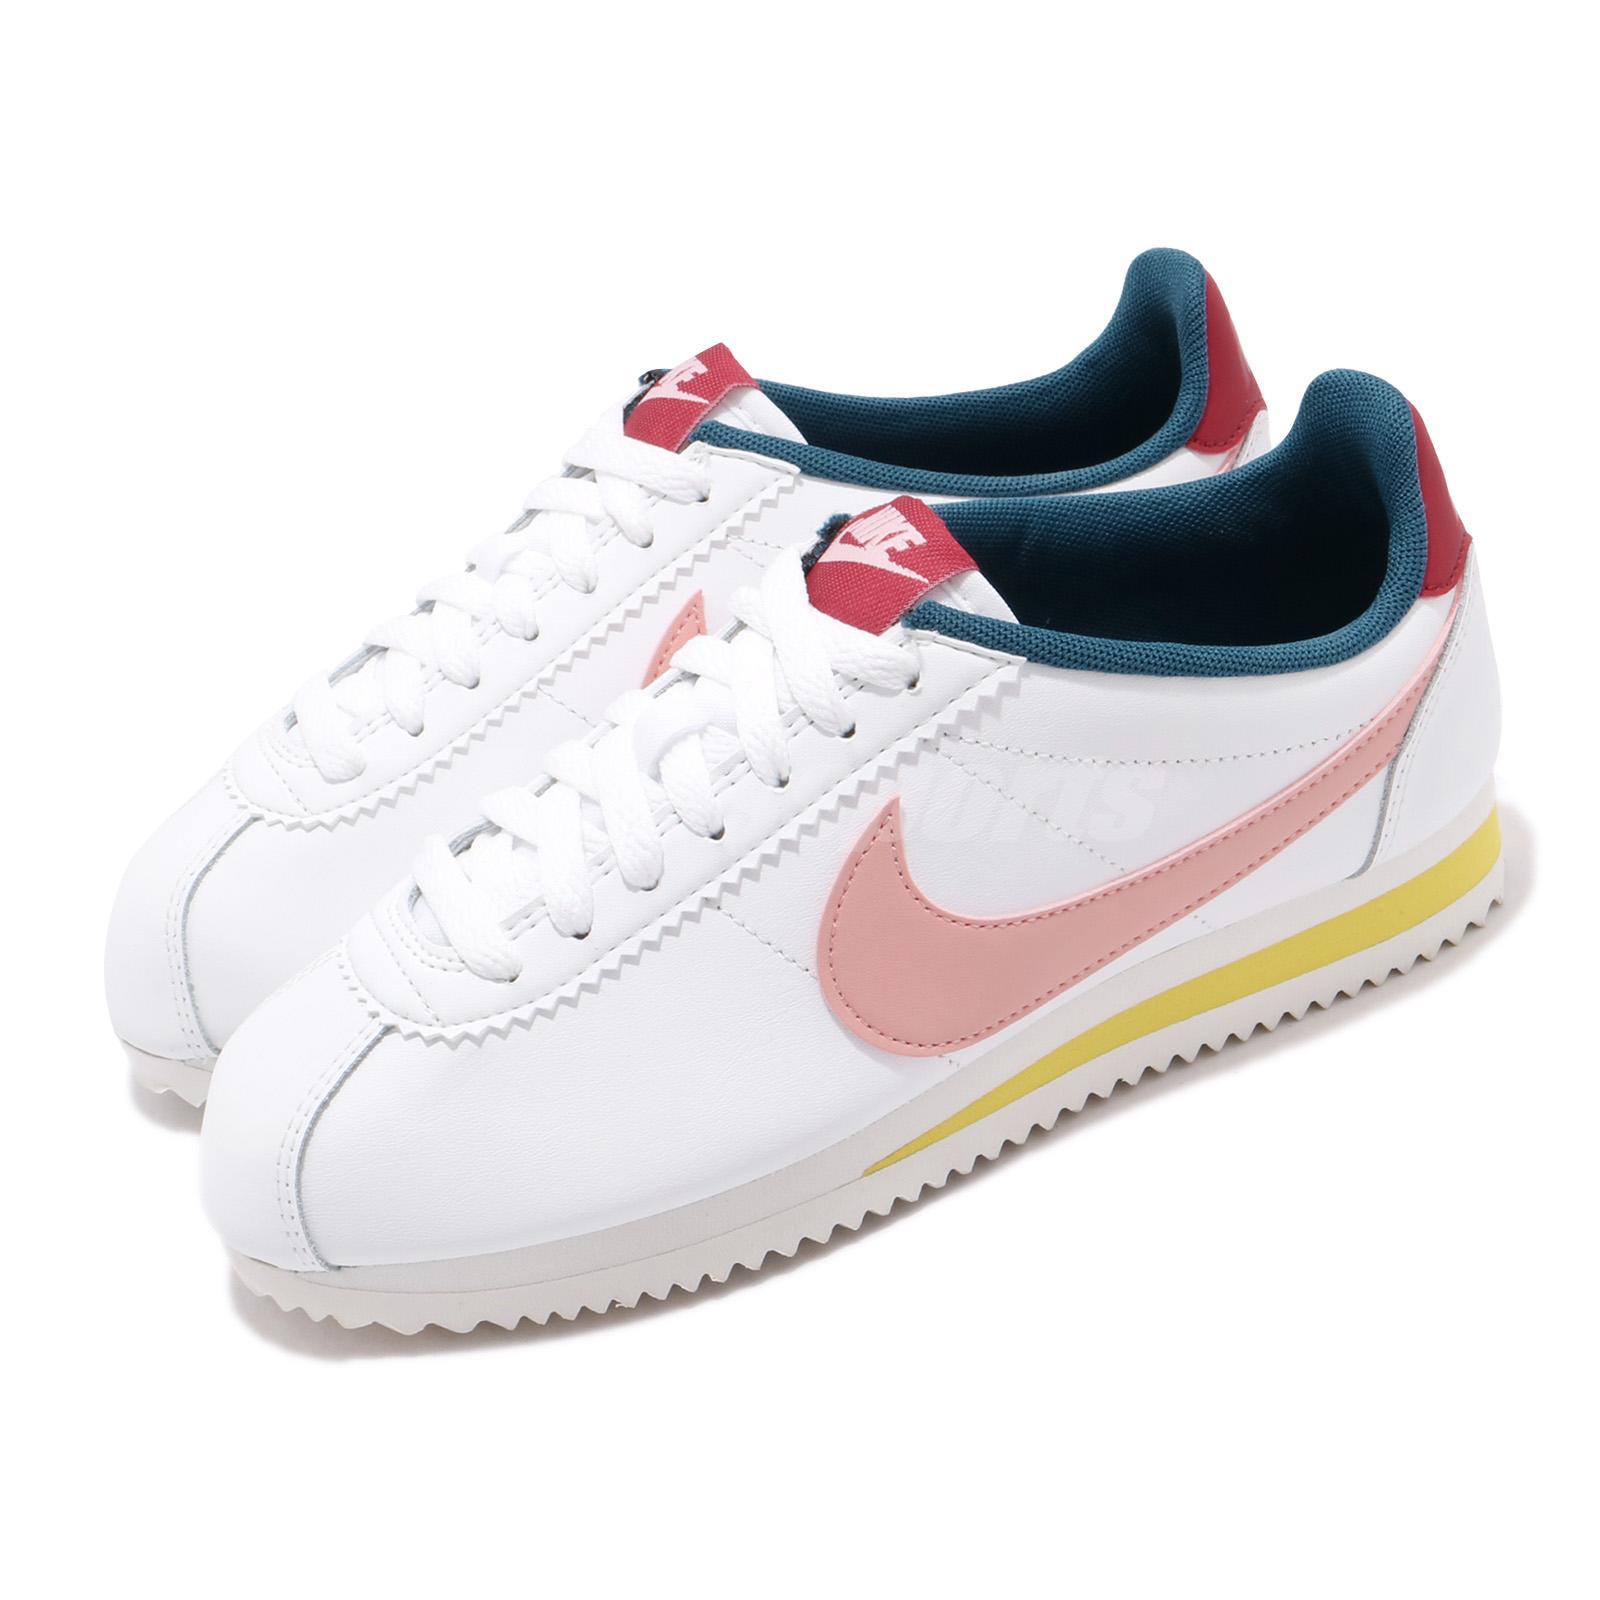 Nike Wmns Classic Cortez Leather White